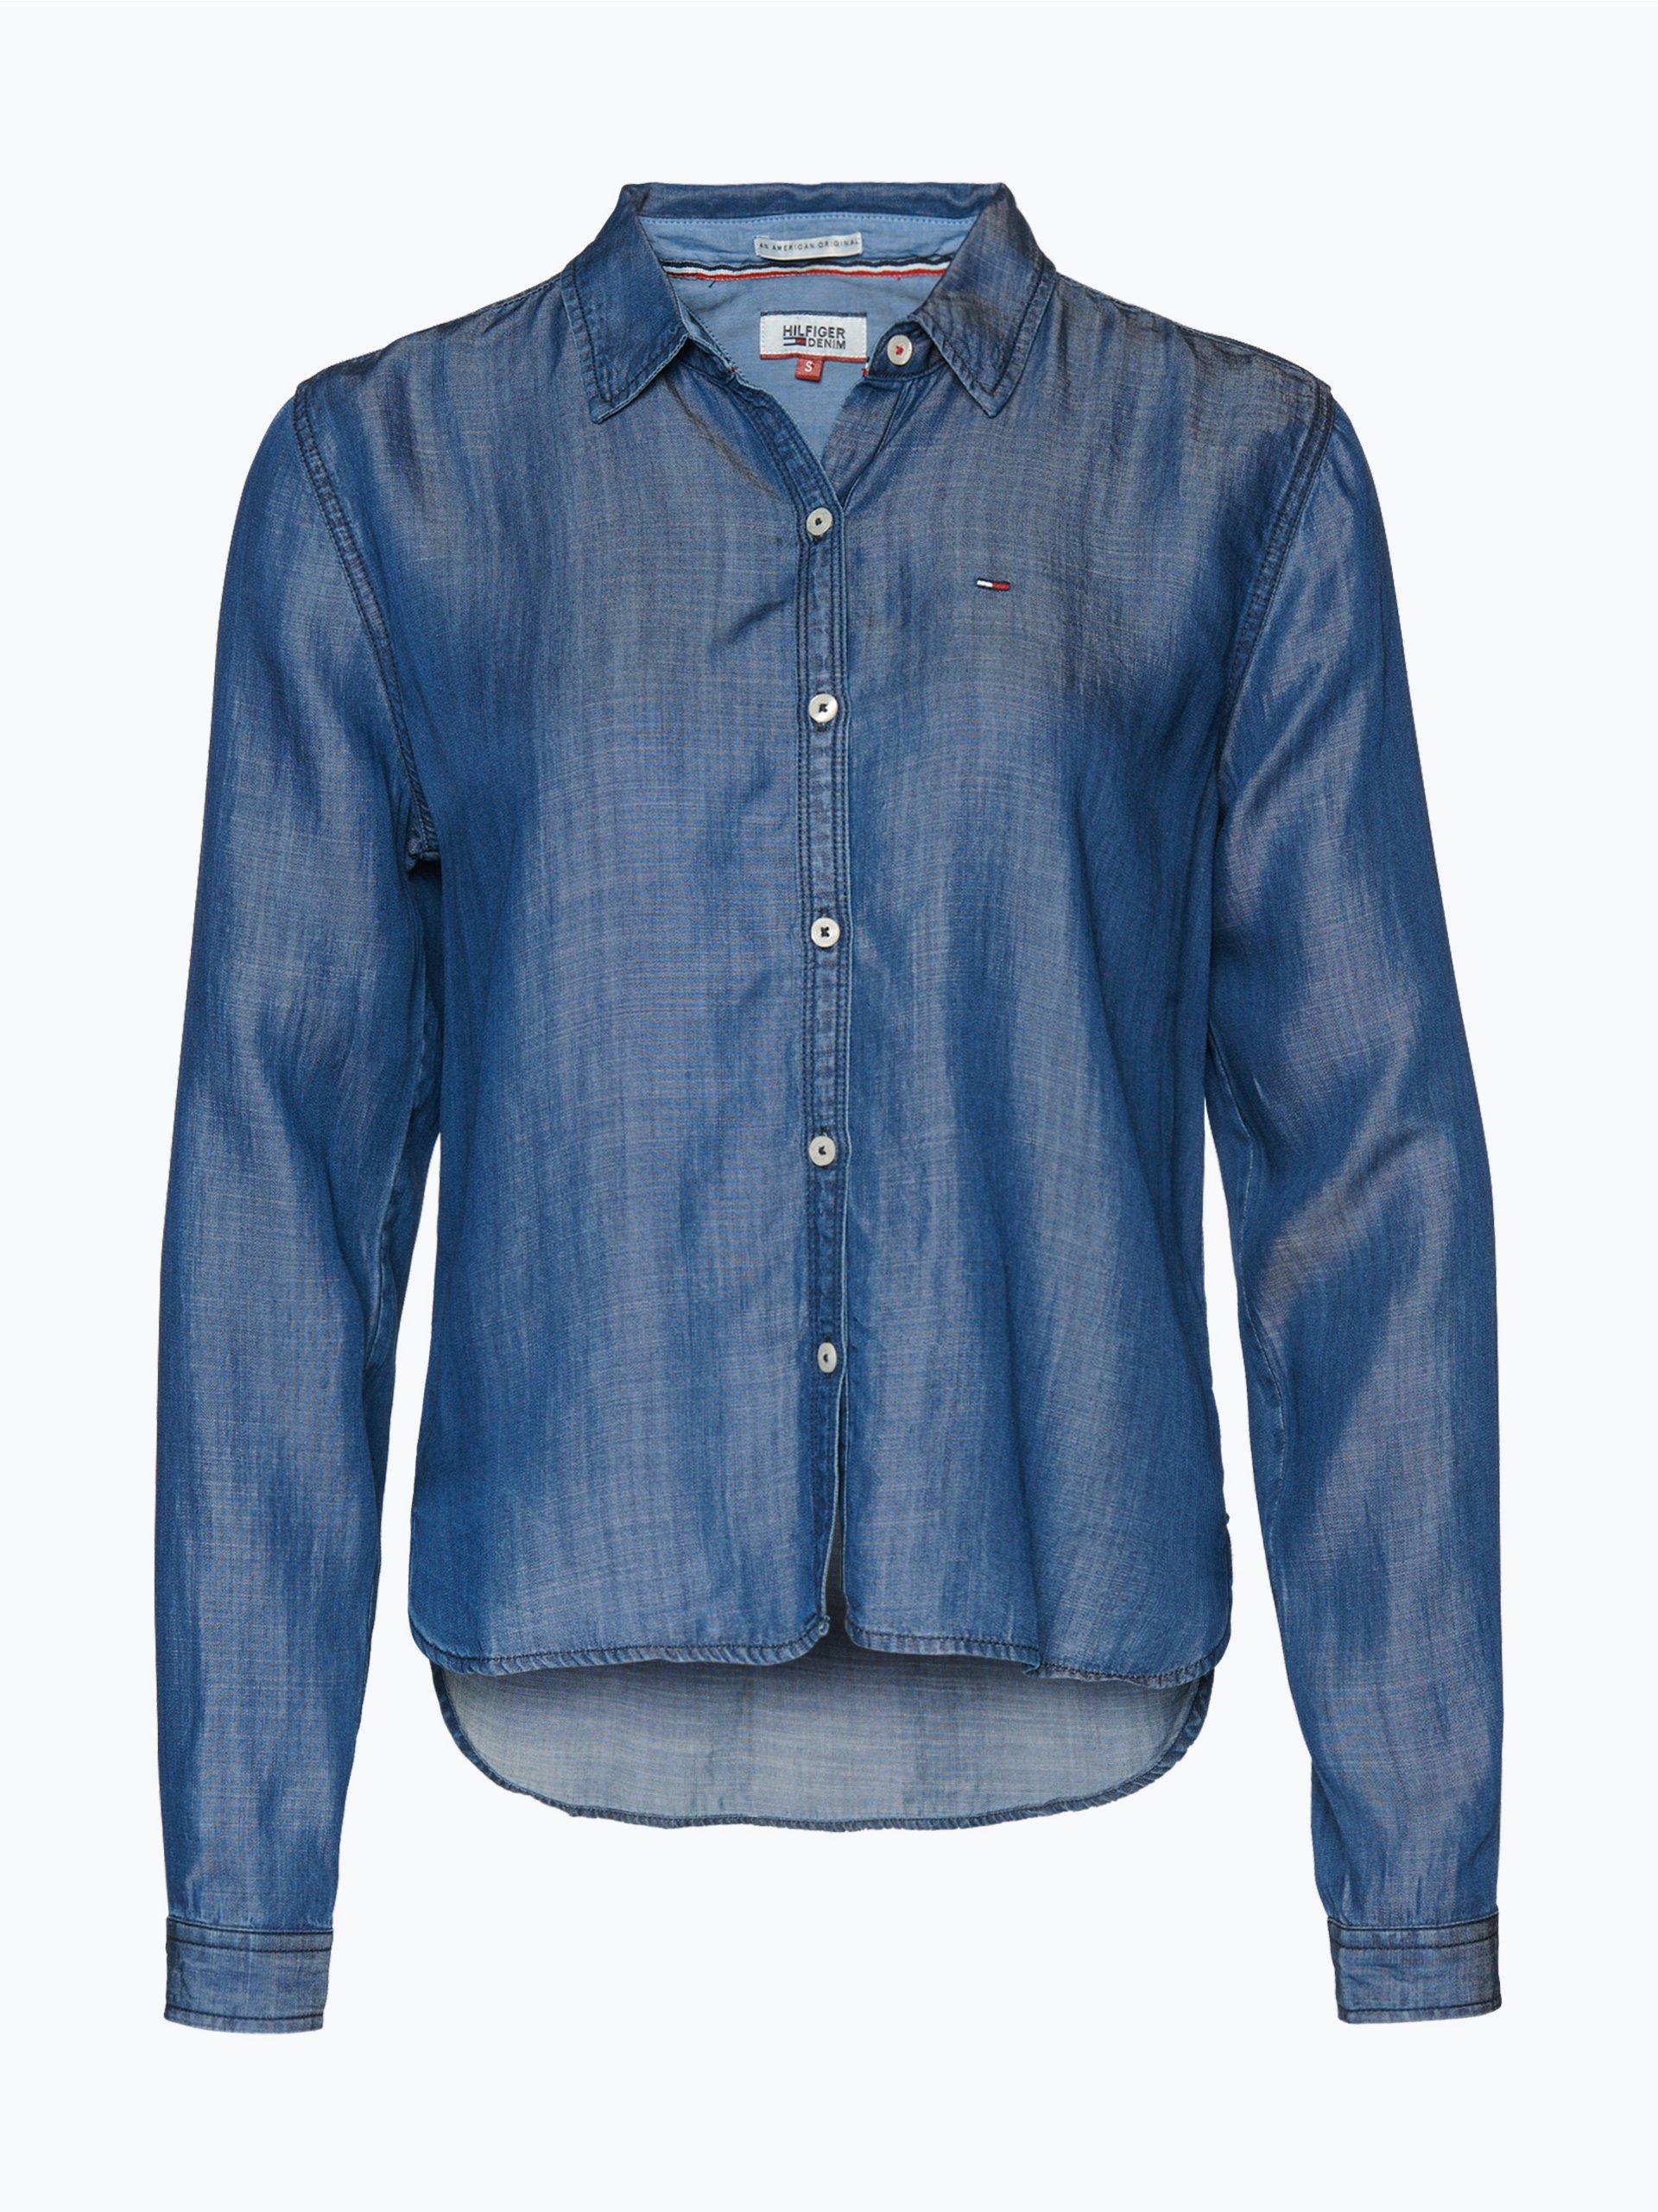 tommy jeans damen jeansbluse marine uni online kaufen. Black Bedroom Furniture Sets. Home Design Ideas